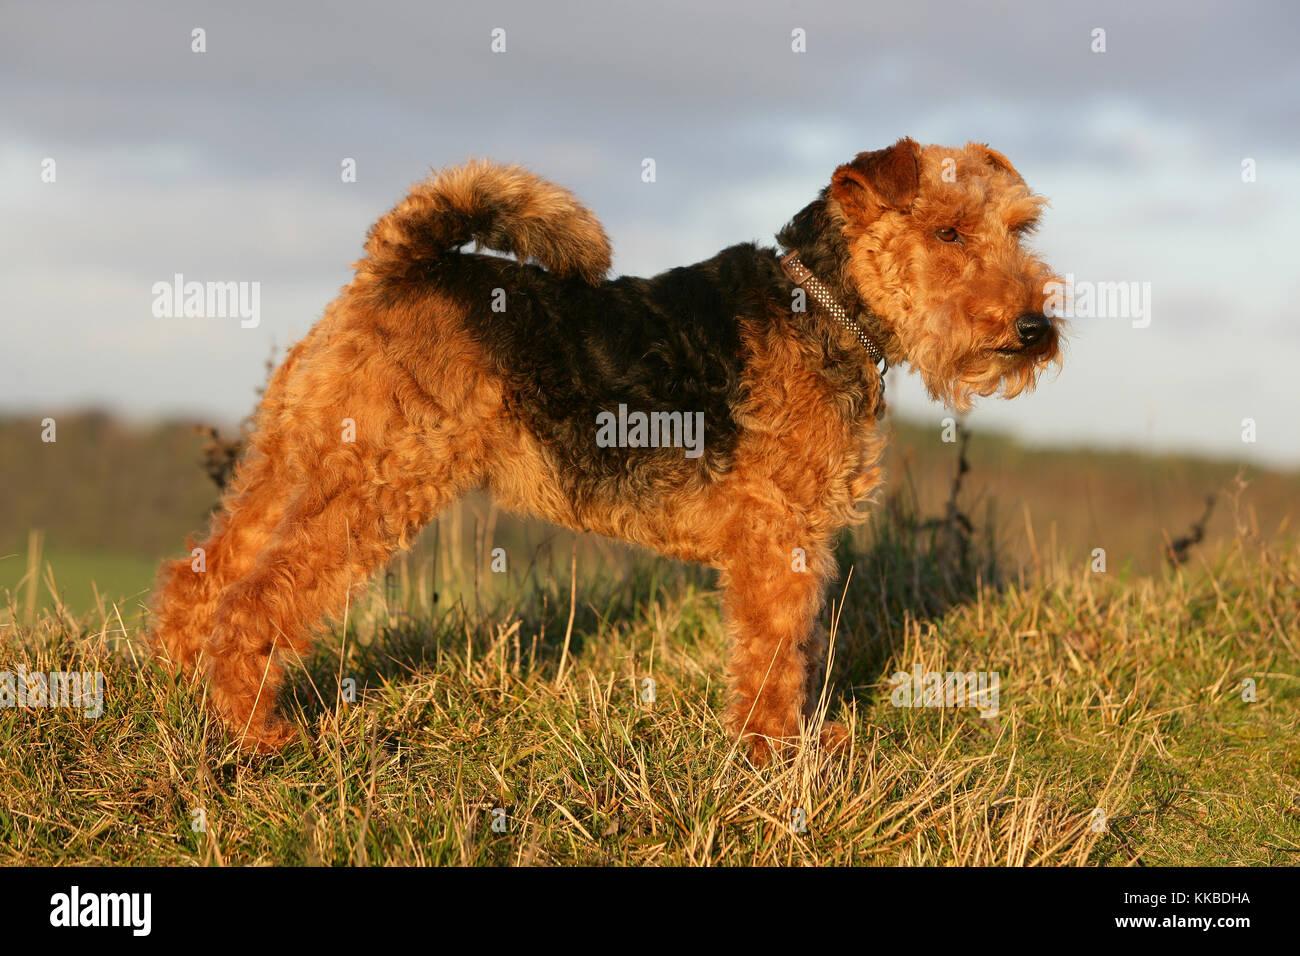 welsh terrier - Stock Image